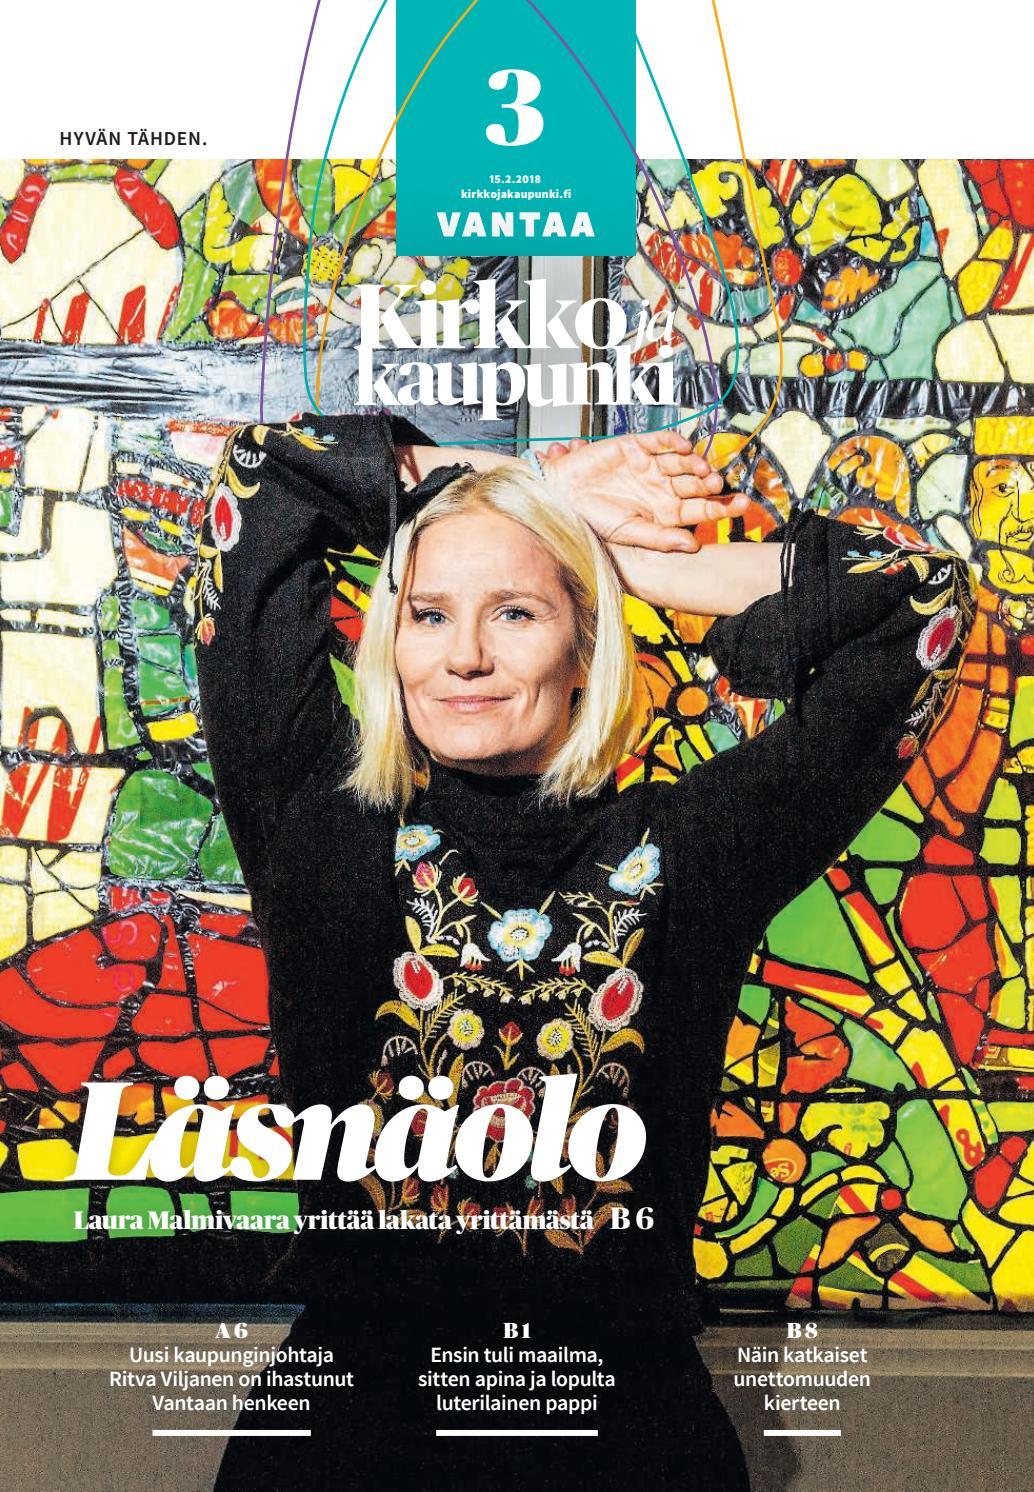 Kirkko ja kaupunki 2018 03 vantaa by Kirkko ja kaupunki - Issuu